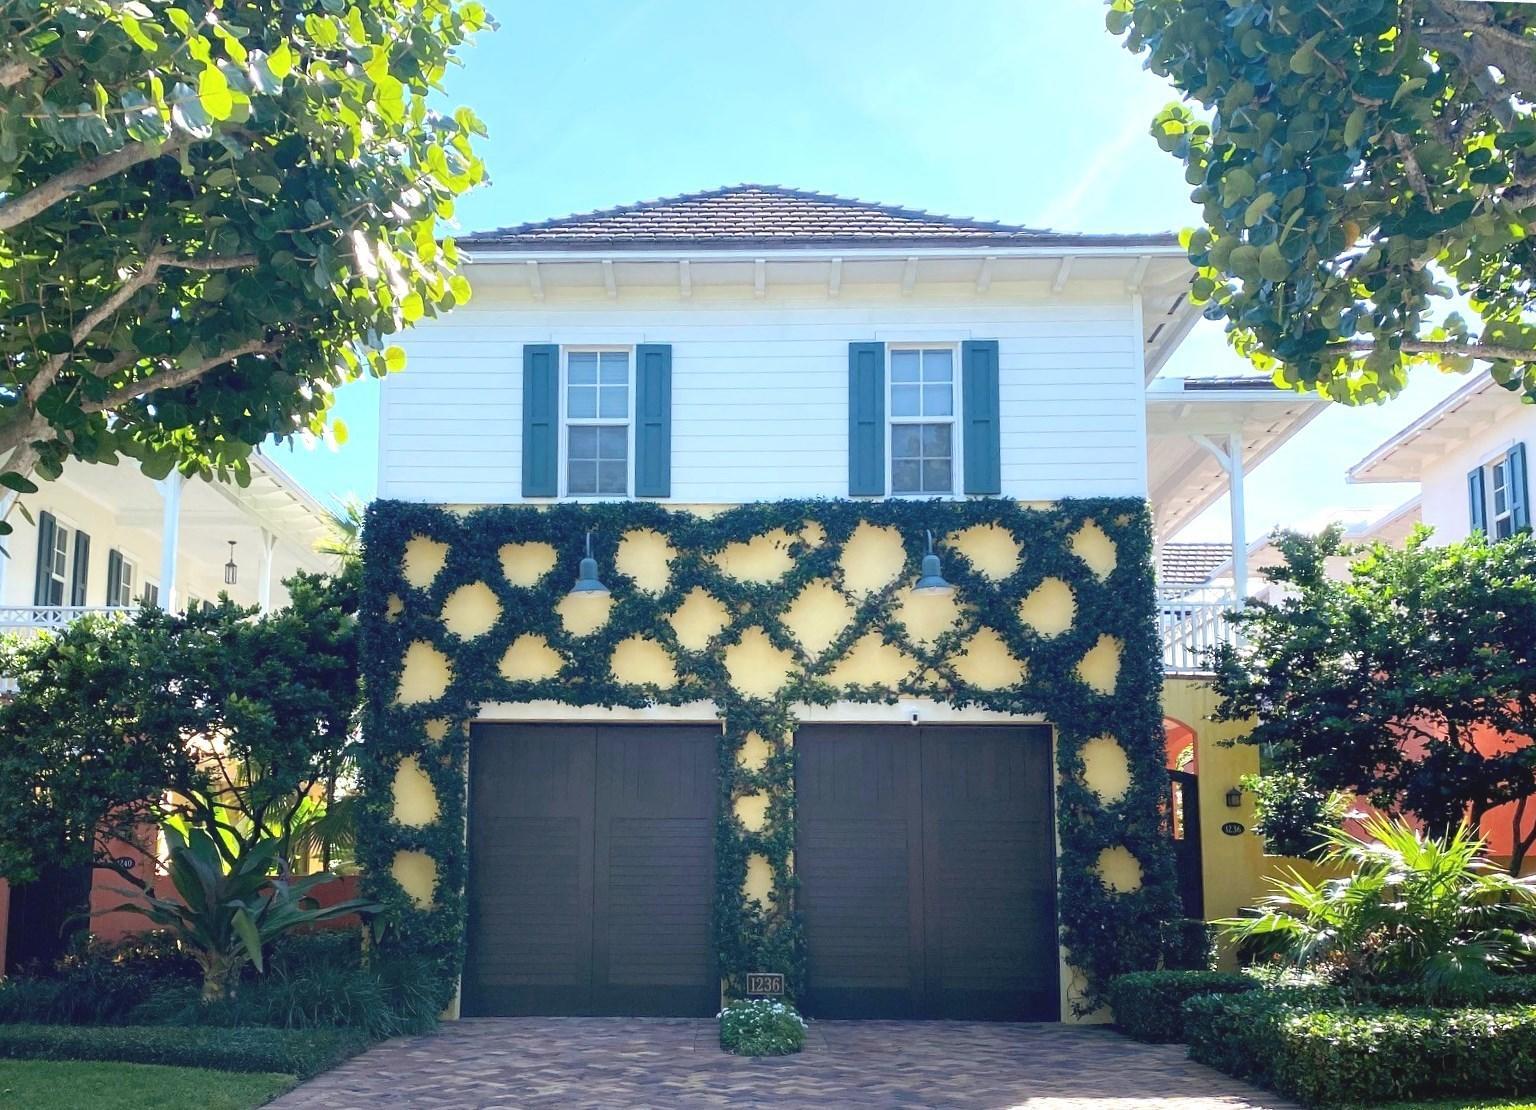 1236 Pelican Lane, Delray Beach, Florida 33483, 3 Bedrooms Bedrooms, ,3.1 BathroomsBathrooms,Townhouse,For Sale,Pelican Lane,RX-10686511